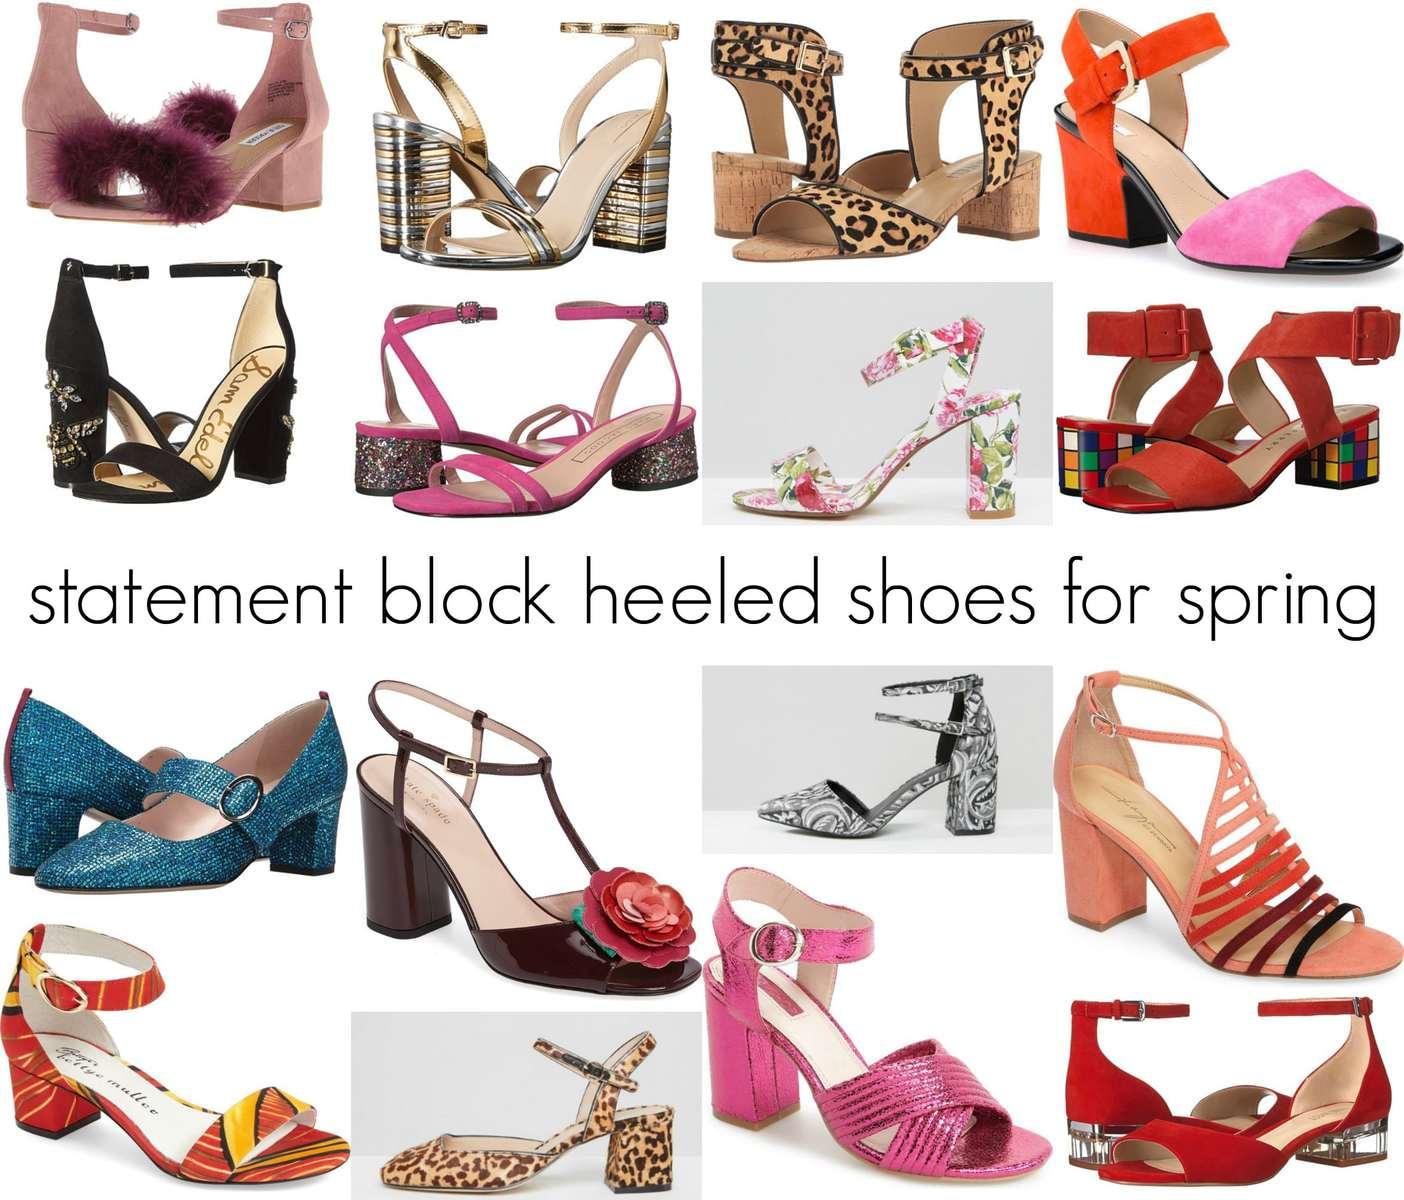 Black Heels Shoes for Spring that Make a Statement - Wardrobe Oxygen